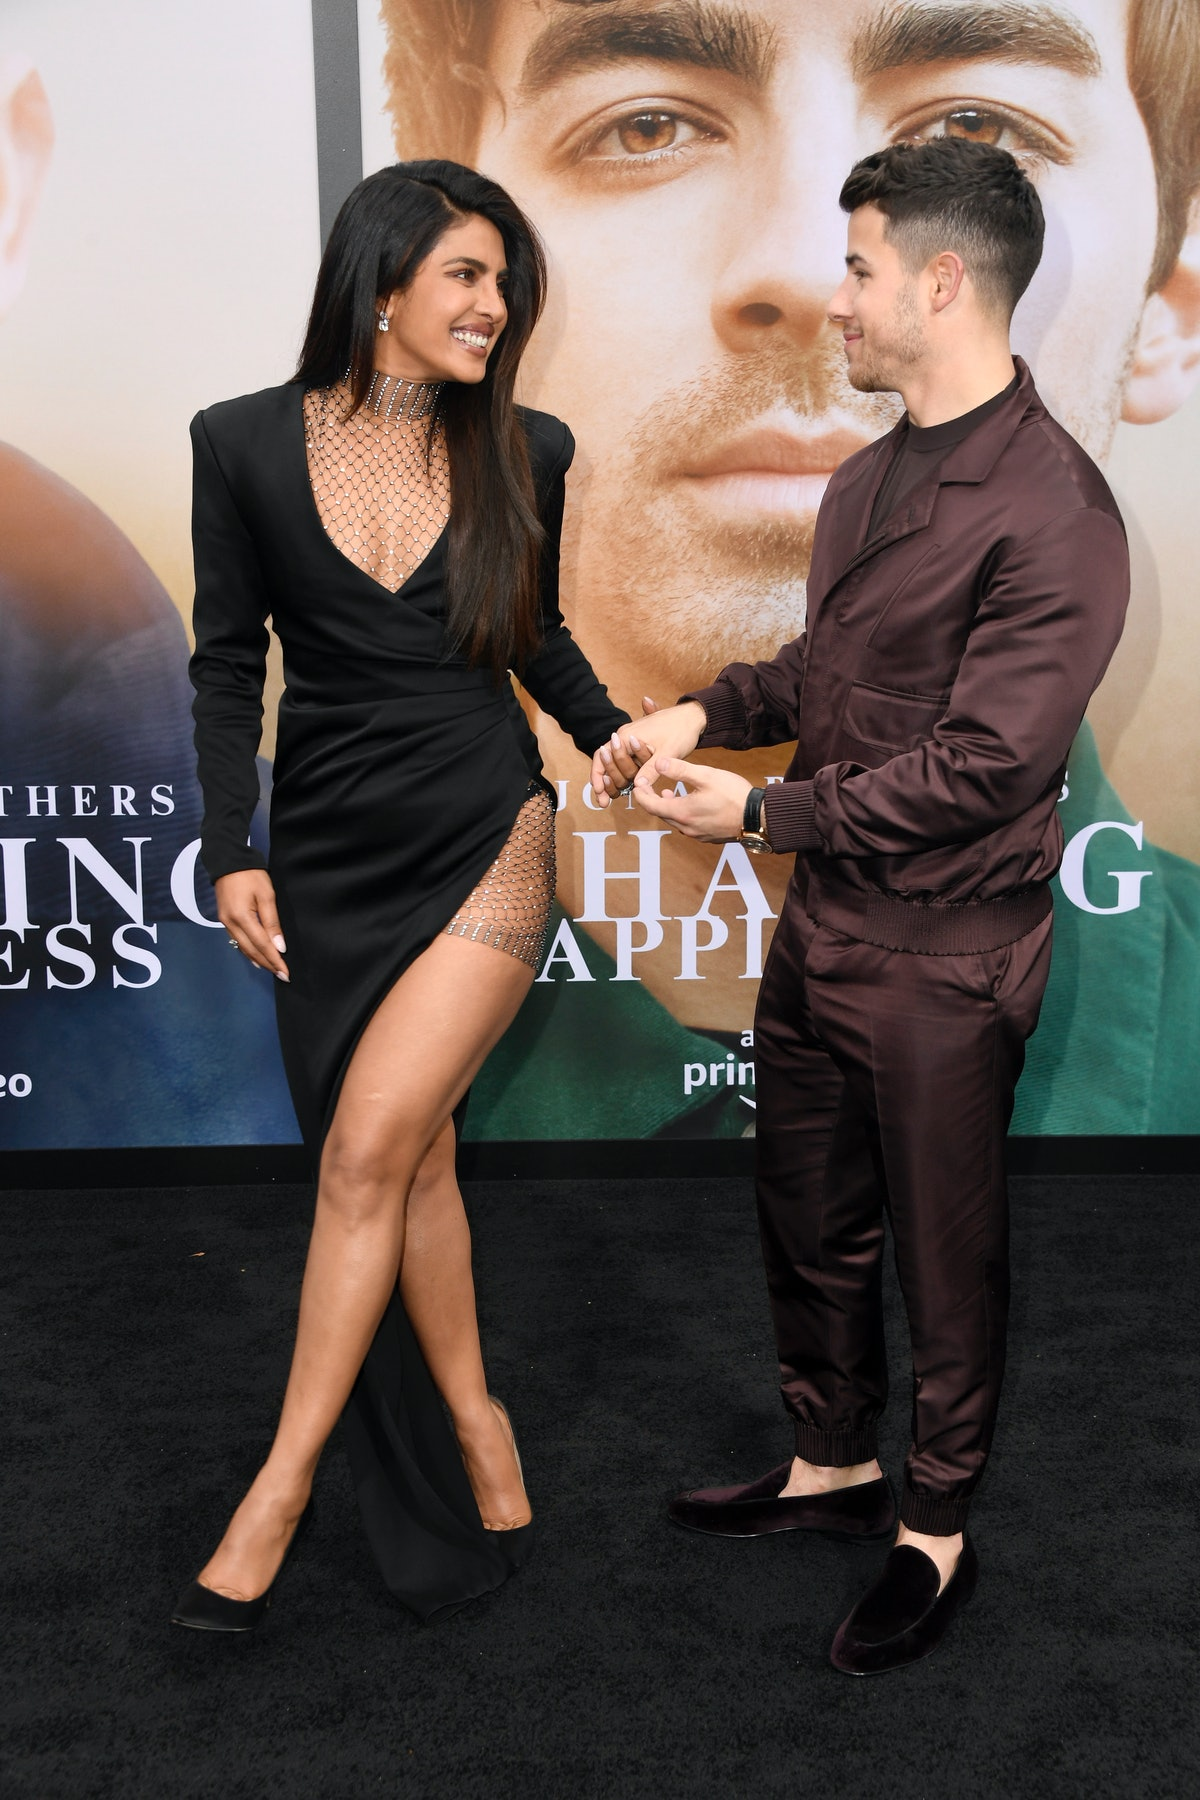 Nick Jonas & Priyanka Chopra at the 'Chasing Happiness' premiere